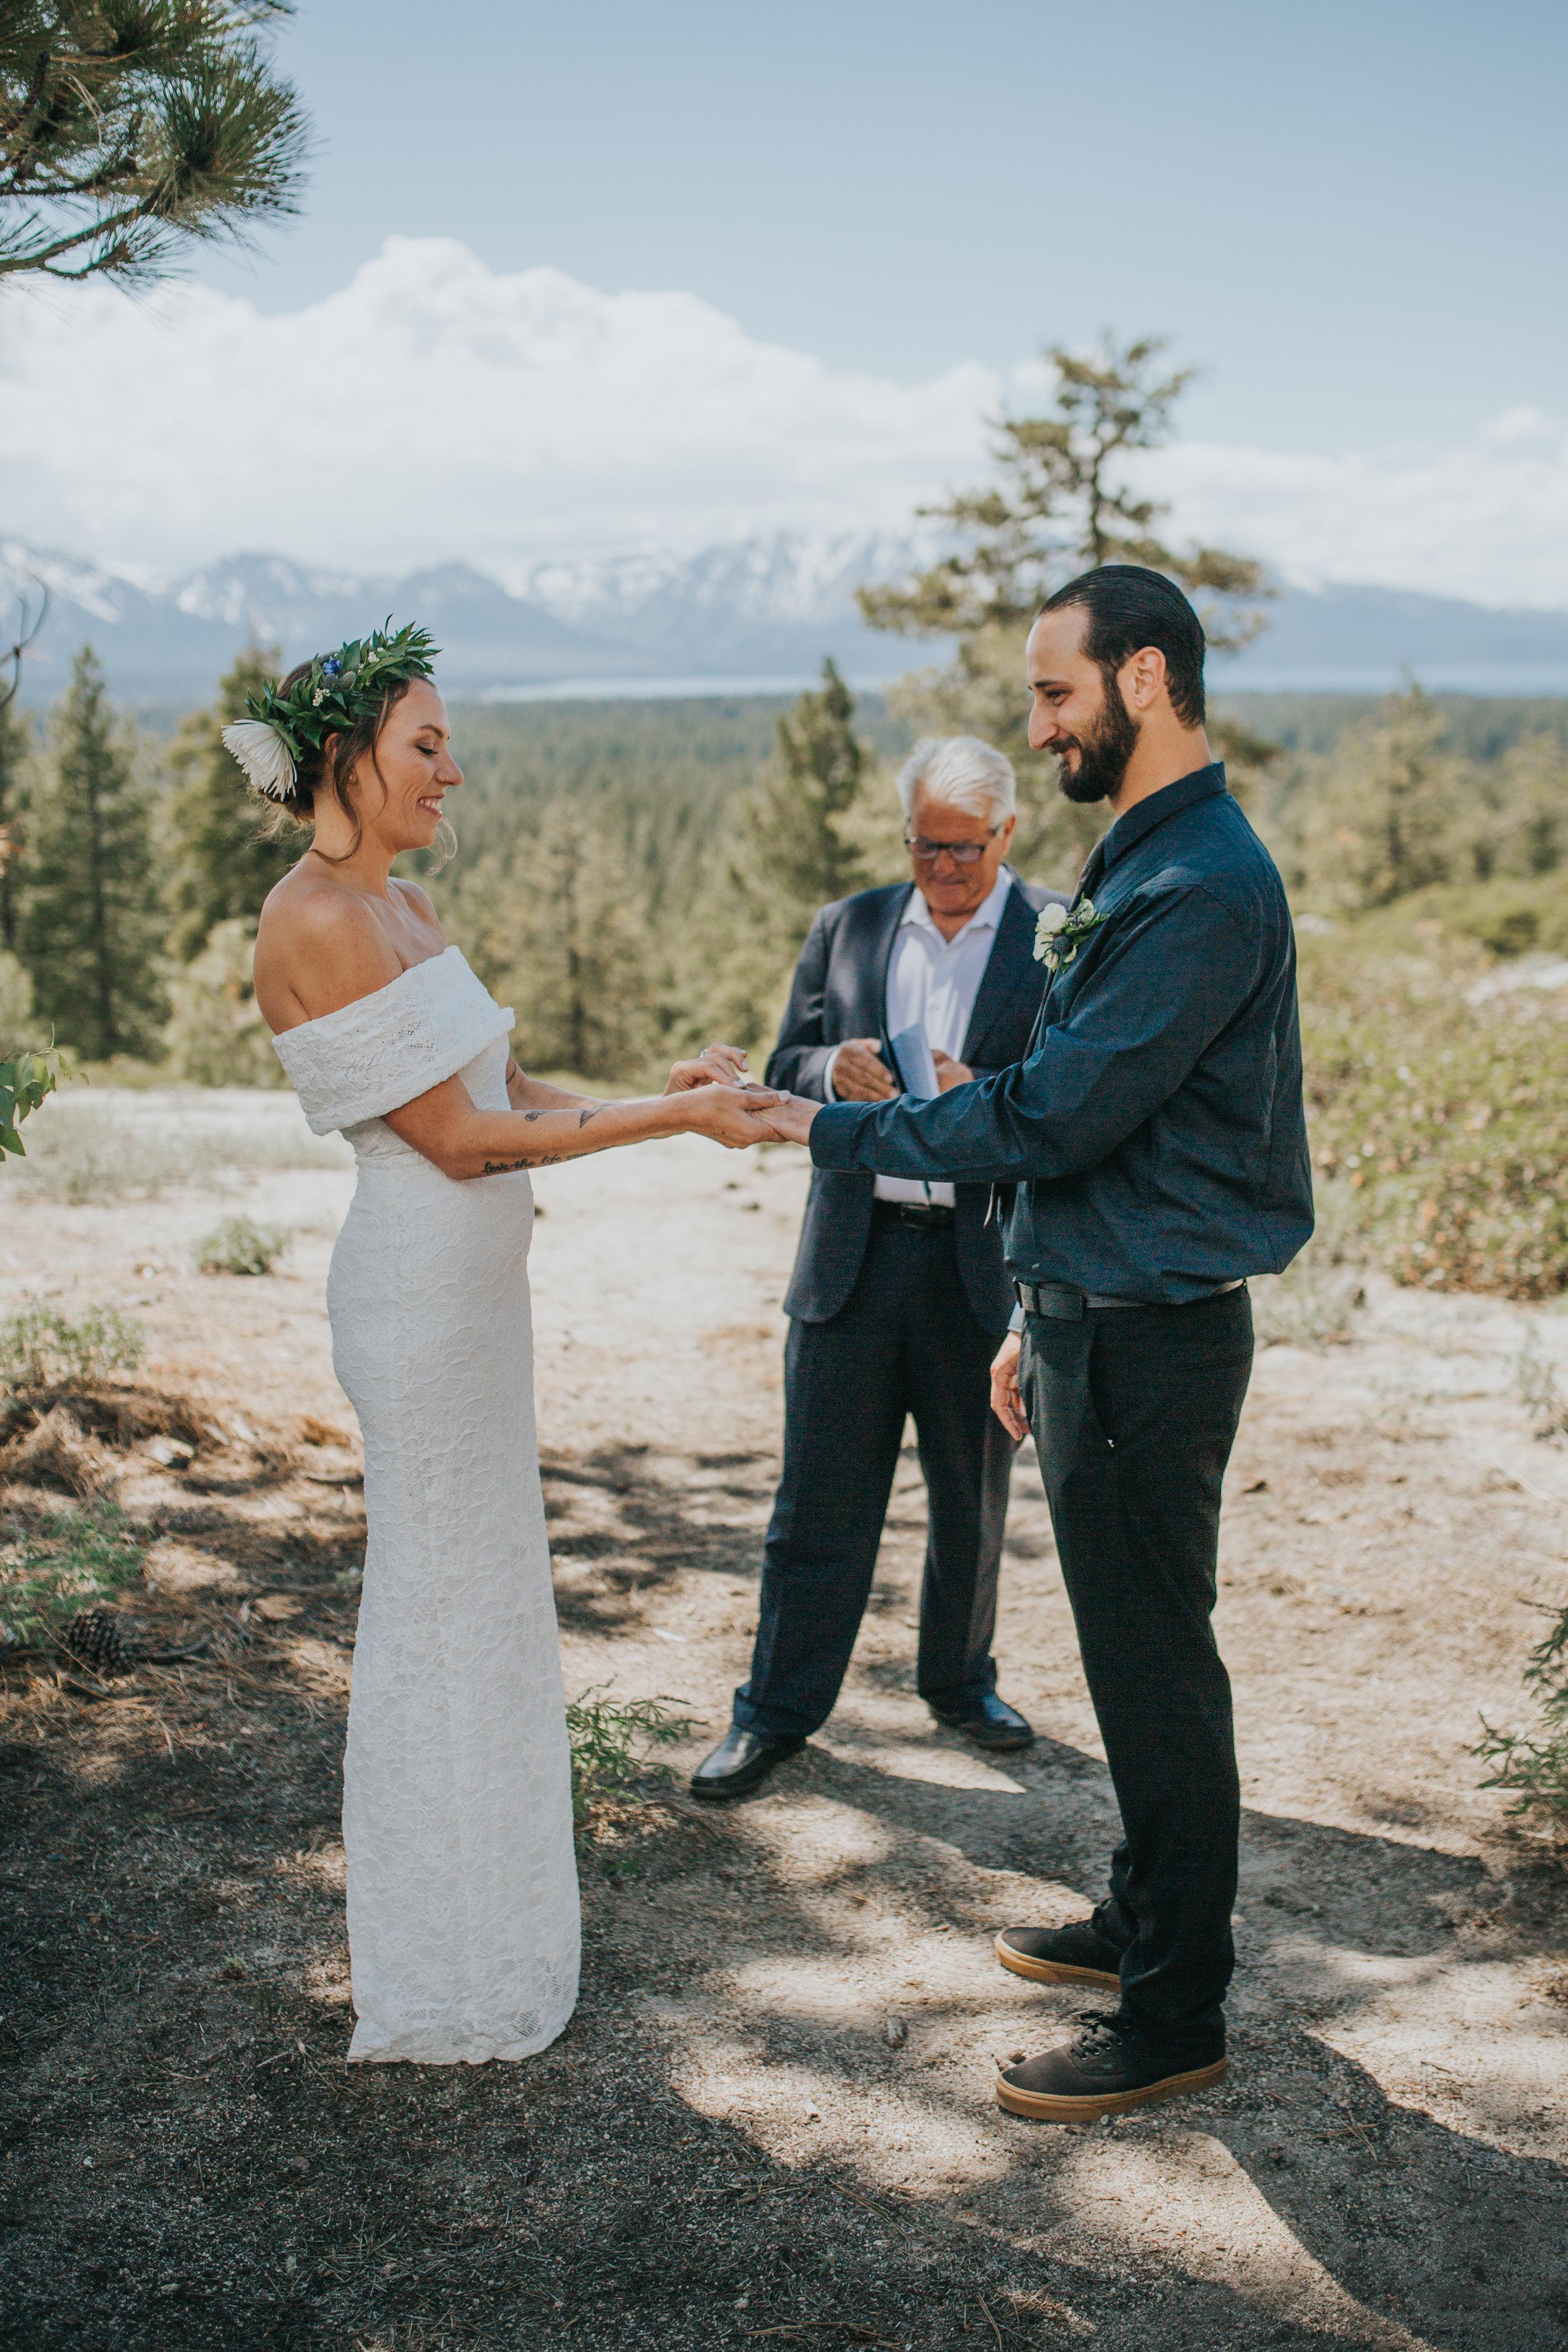 south-lake-tahoe-elopement-valerie-lendvay-photo-031.jpg